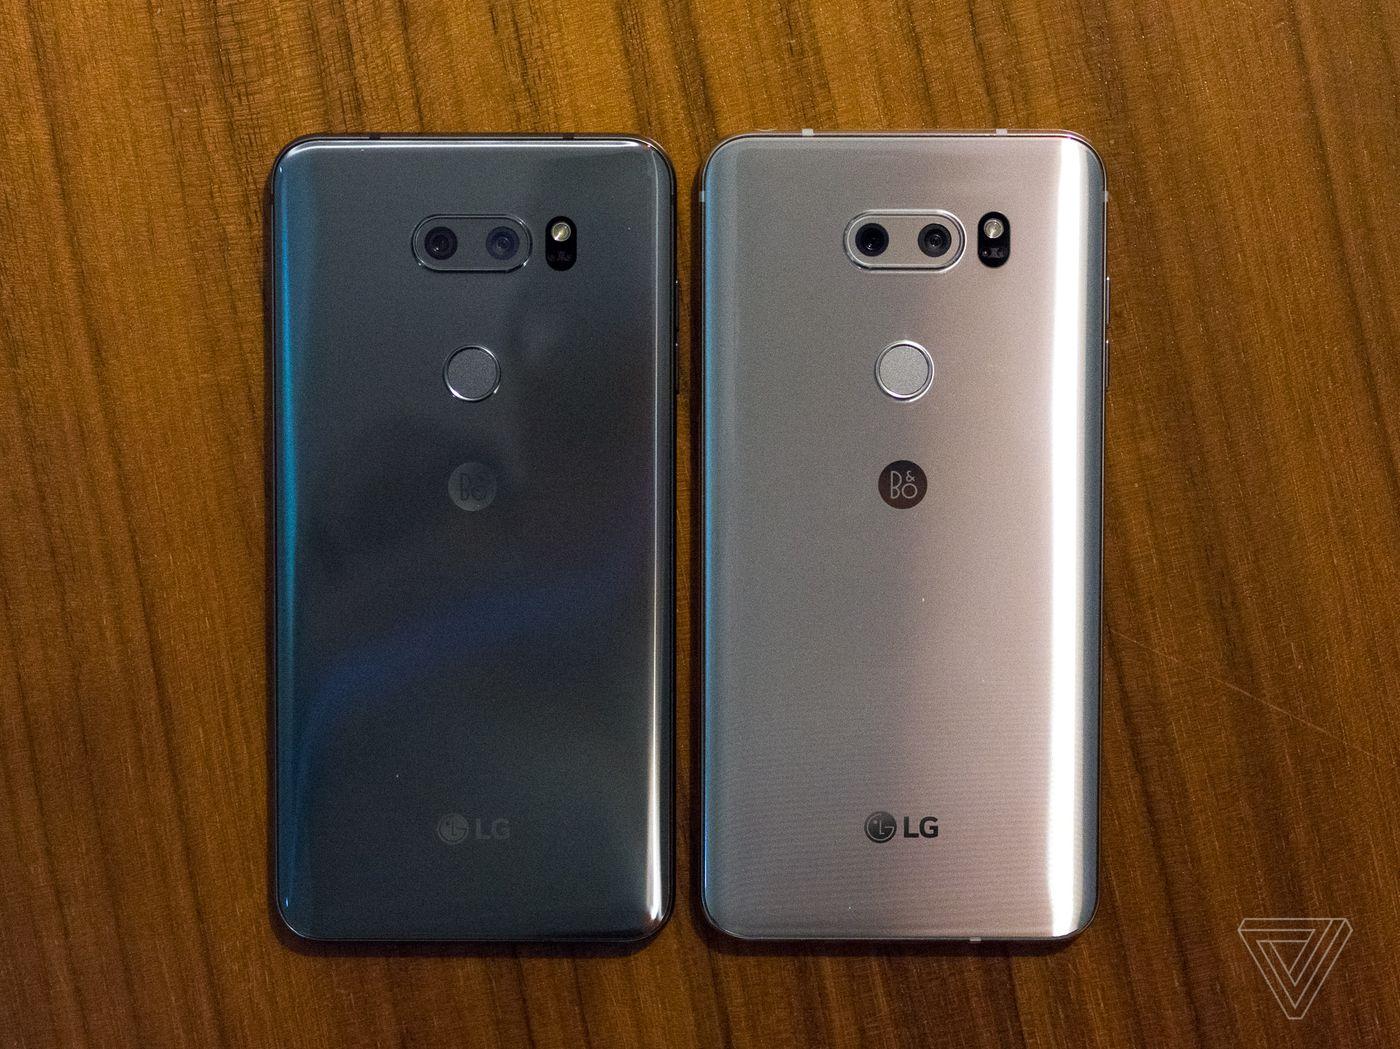 LG's V30S ThinQ is a V30 with more RAM and AI - The Verge